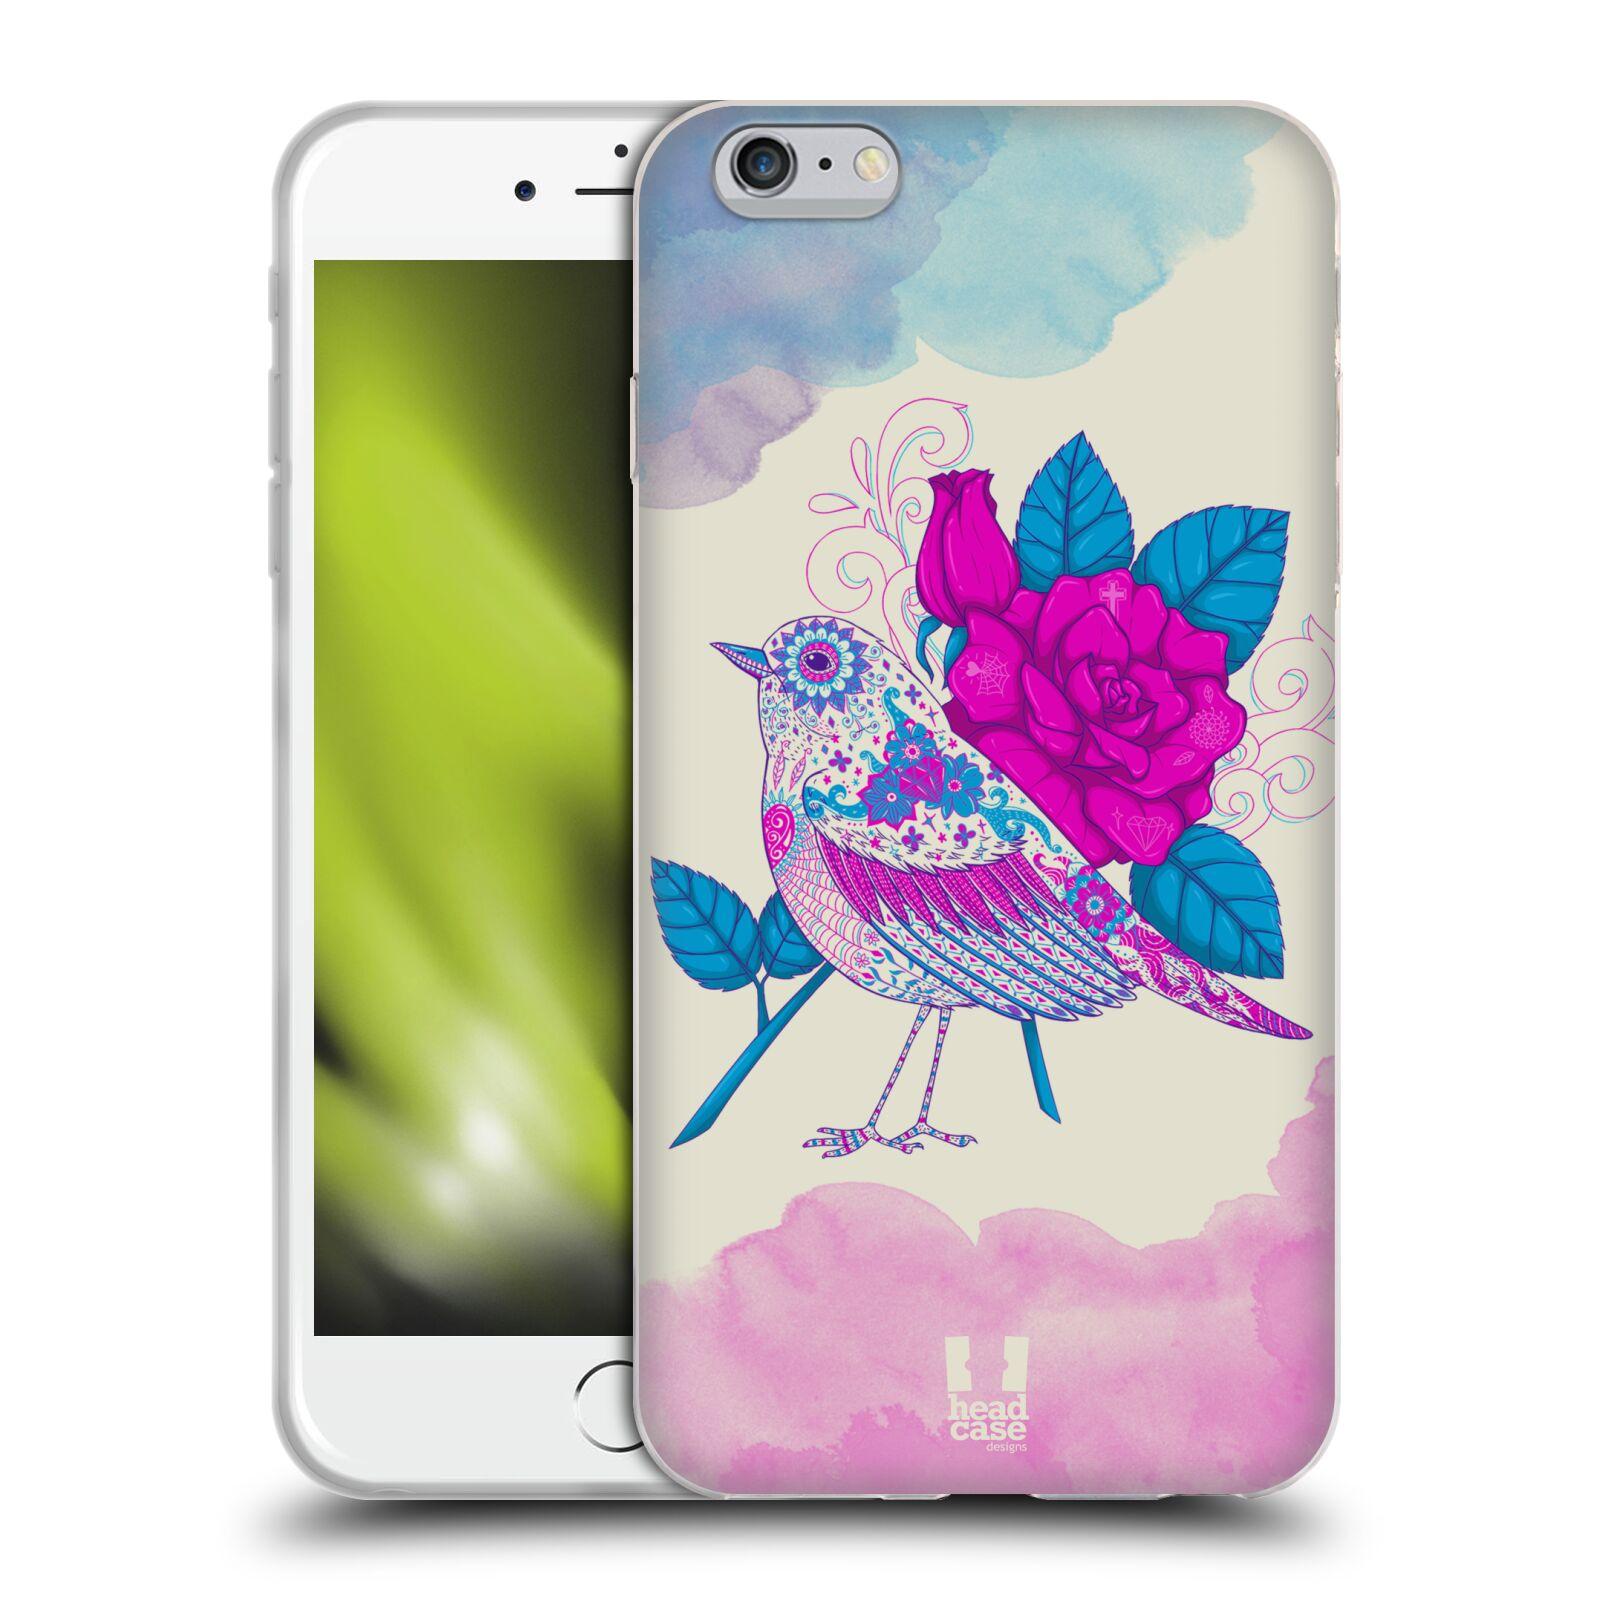 HEAD CASE silikonový obal na mobil Apple Iphone 6 PLUS/ 6S PLUS vzor Květina ptáčci FIALOVÁ